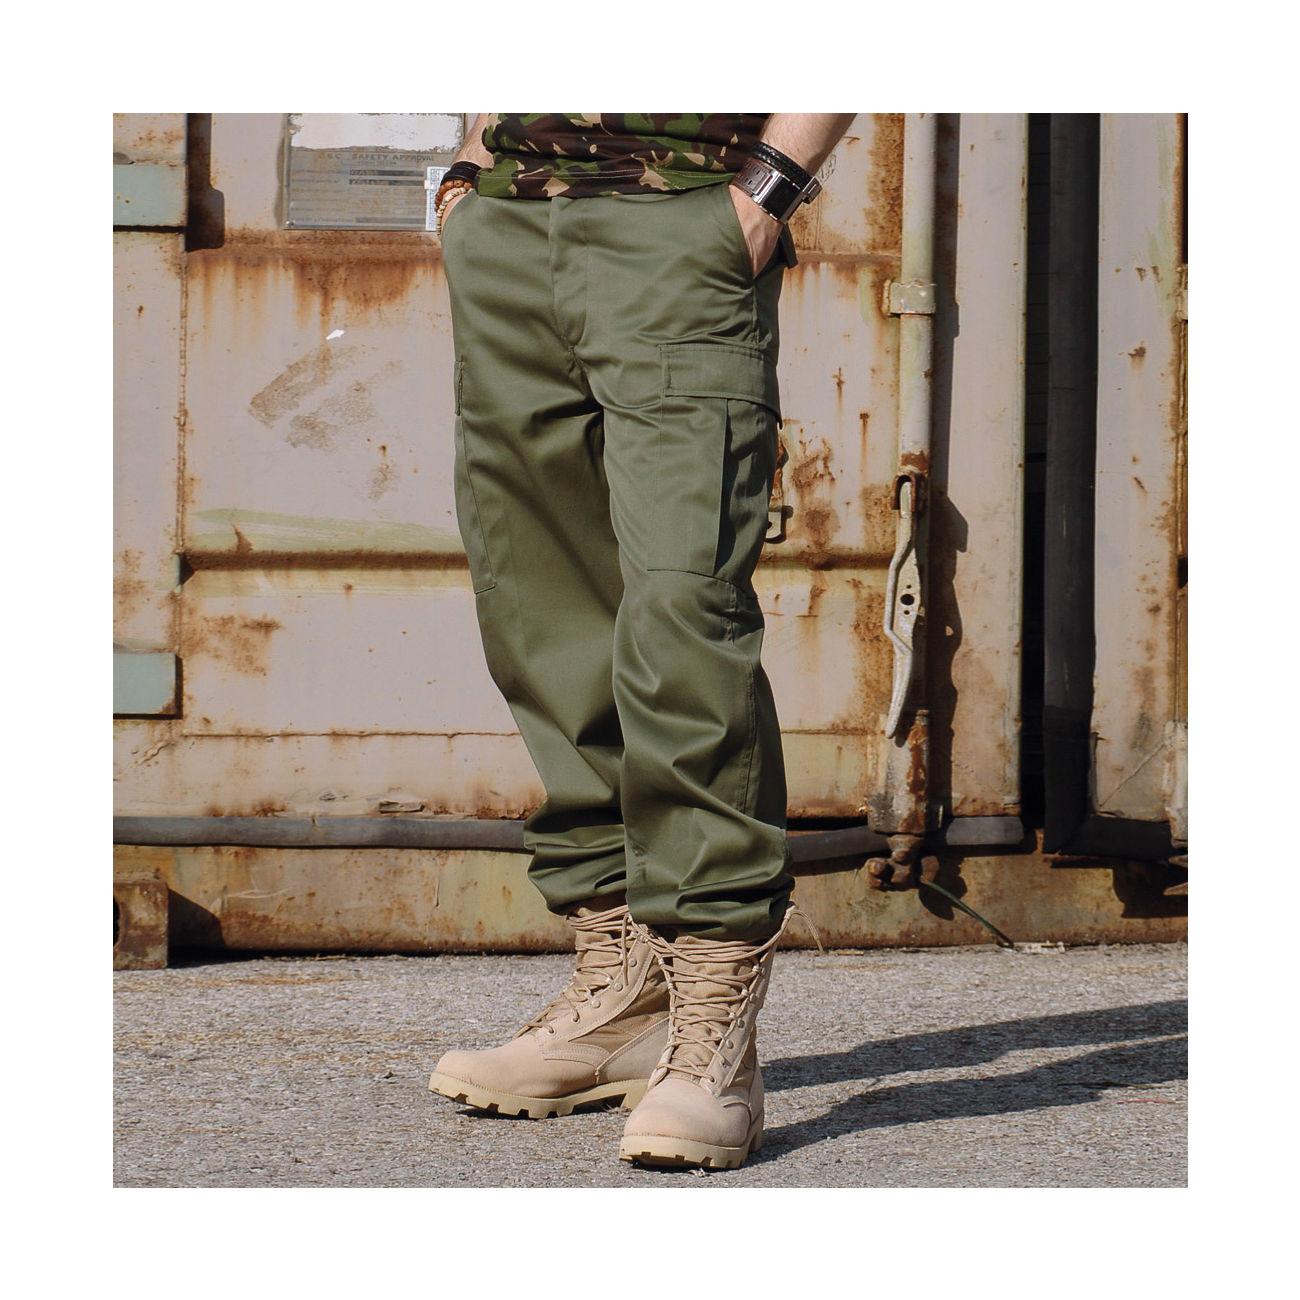 cac79827453b5e Mil-Tec Hose US Ranger Typ BDU oliv günstig kaufen - Kotte   Zeller